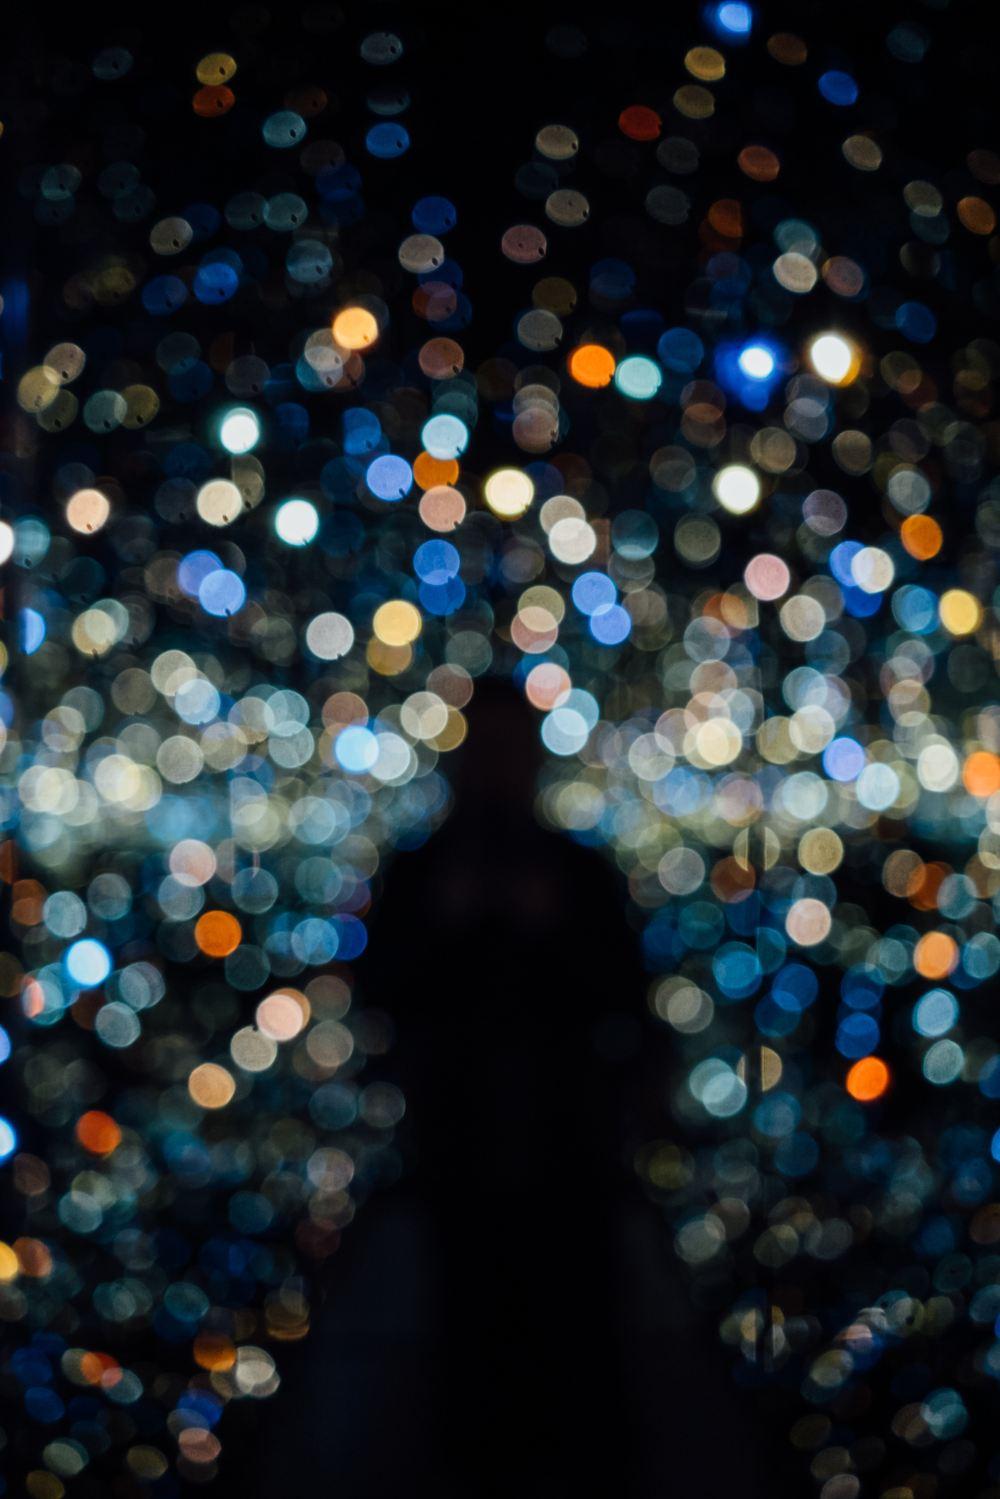 blurred lights 100 best